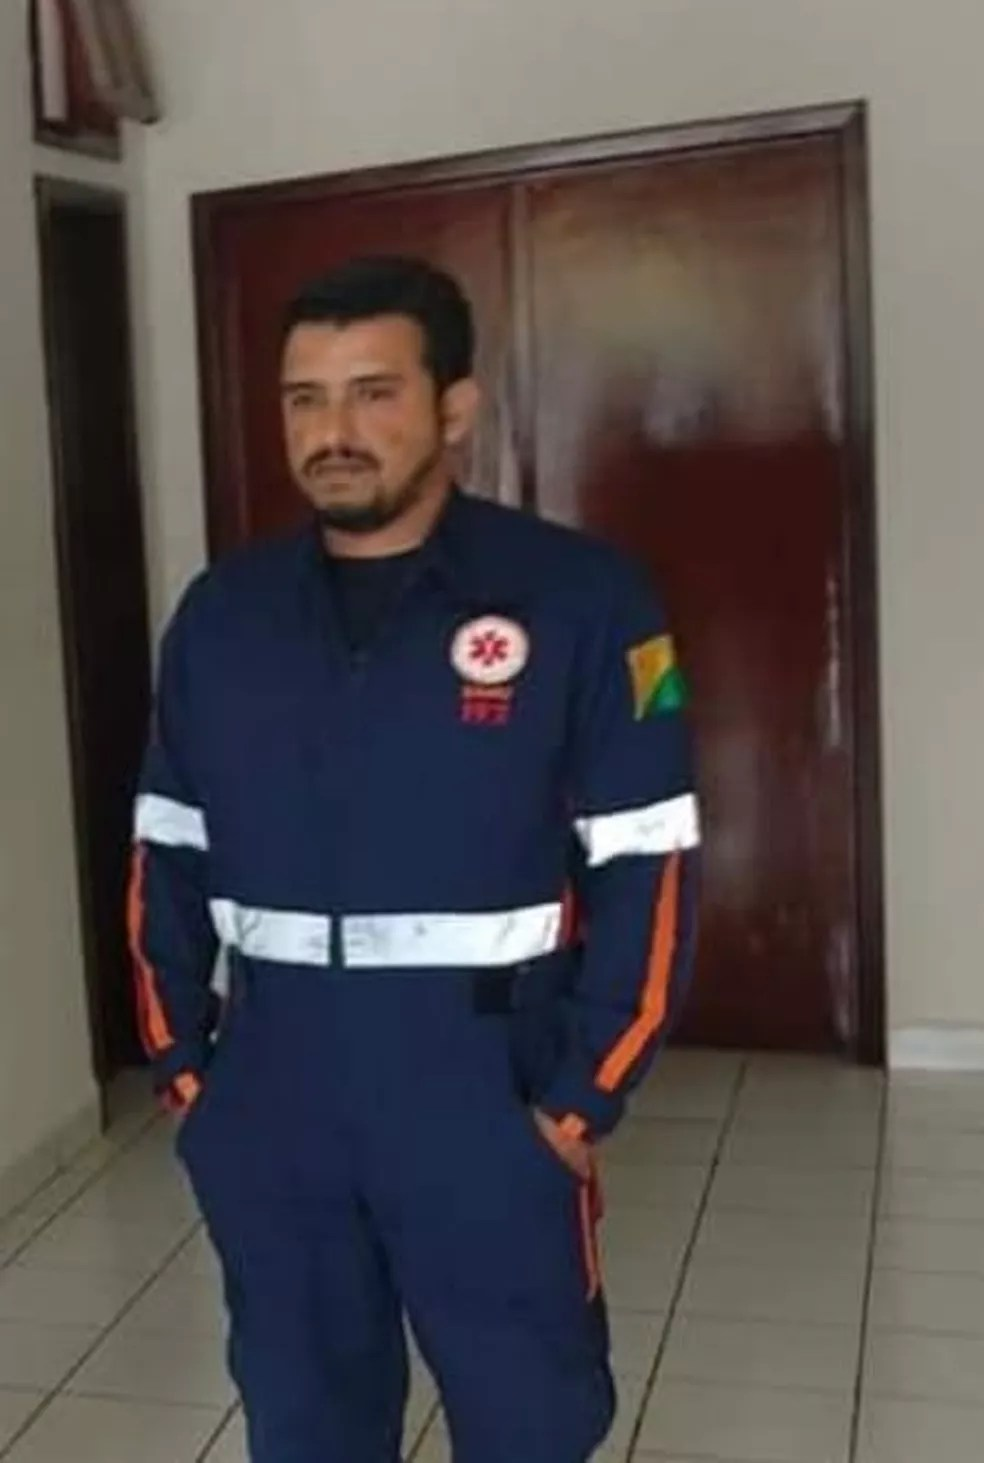 Condutor da ambulância José Augusto Aiache diz ter sido ofendido — Foto: Arquivo pessoal